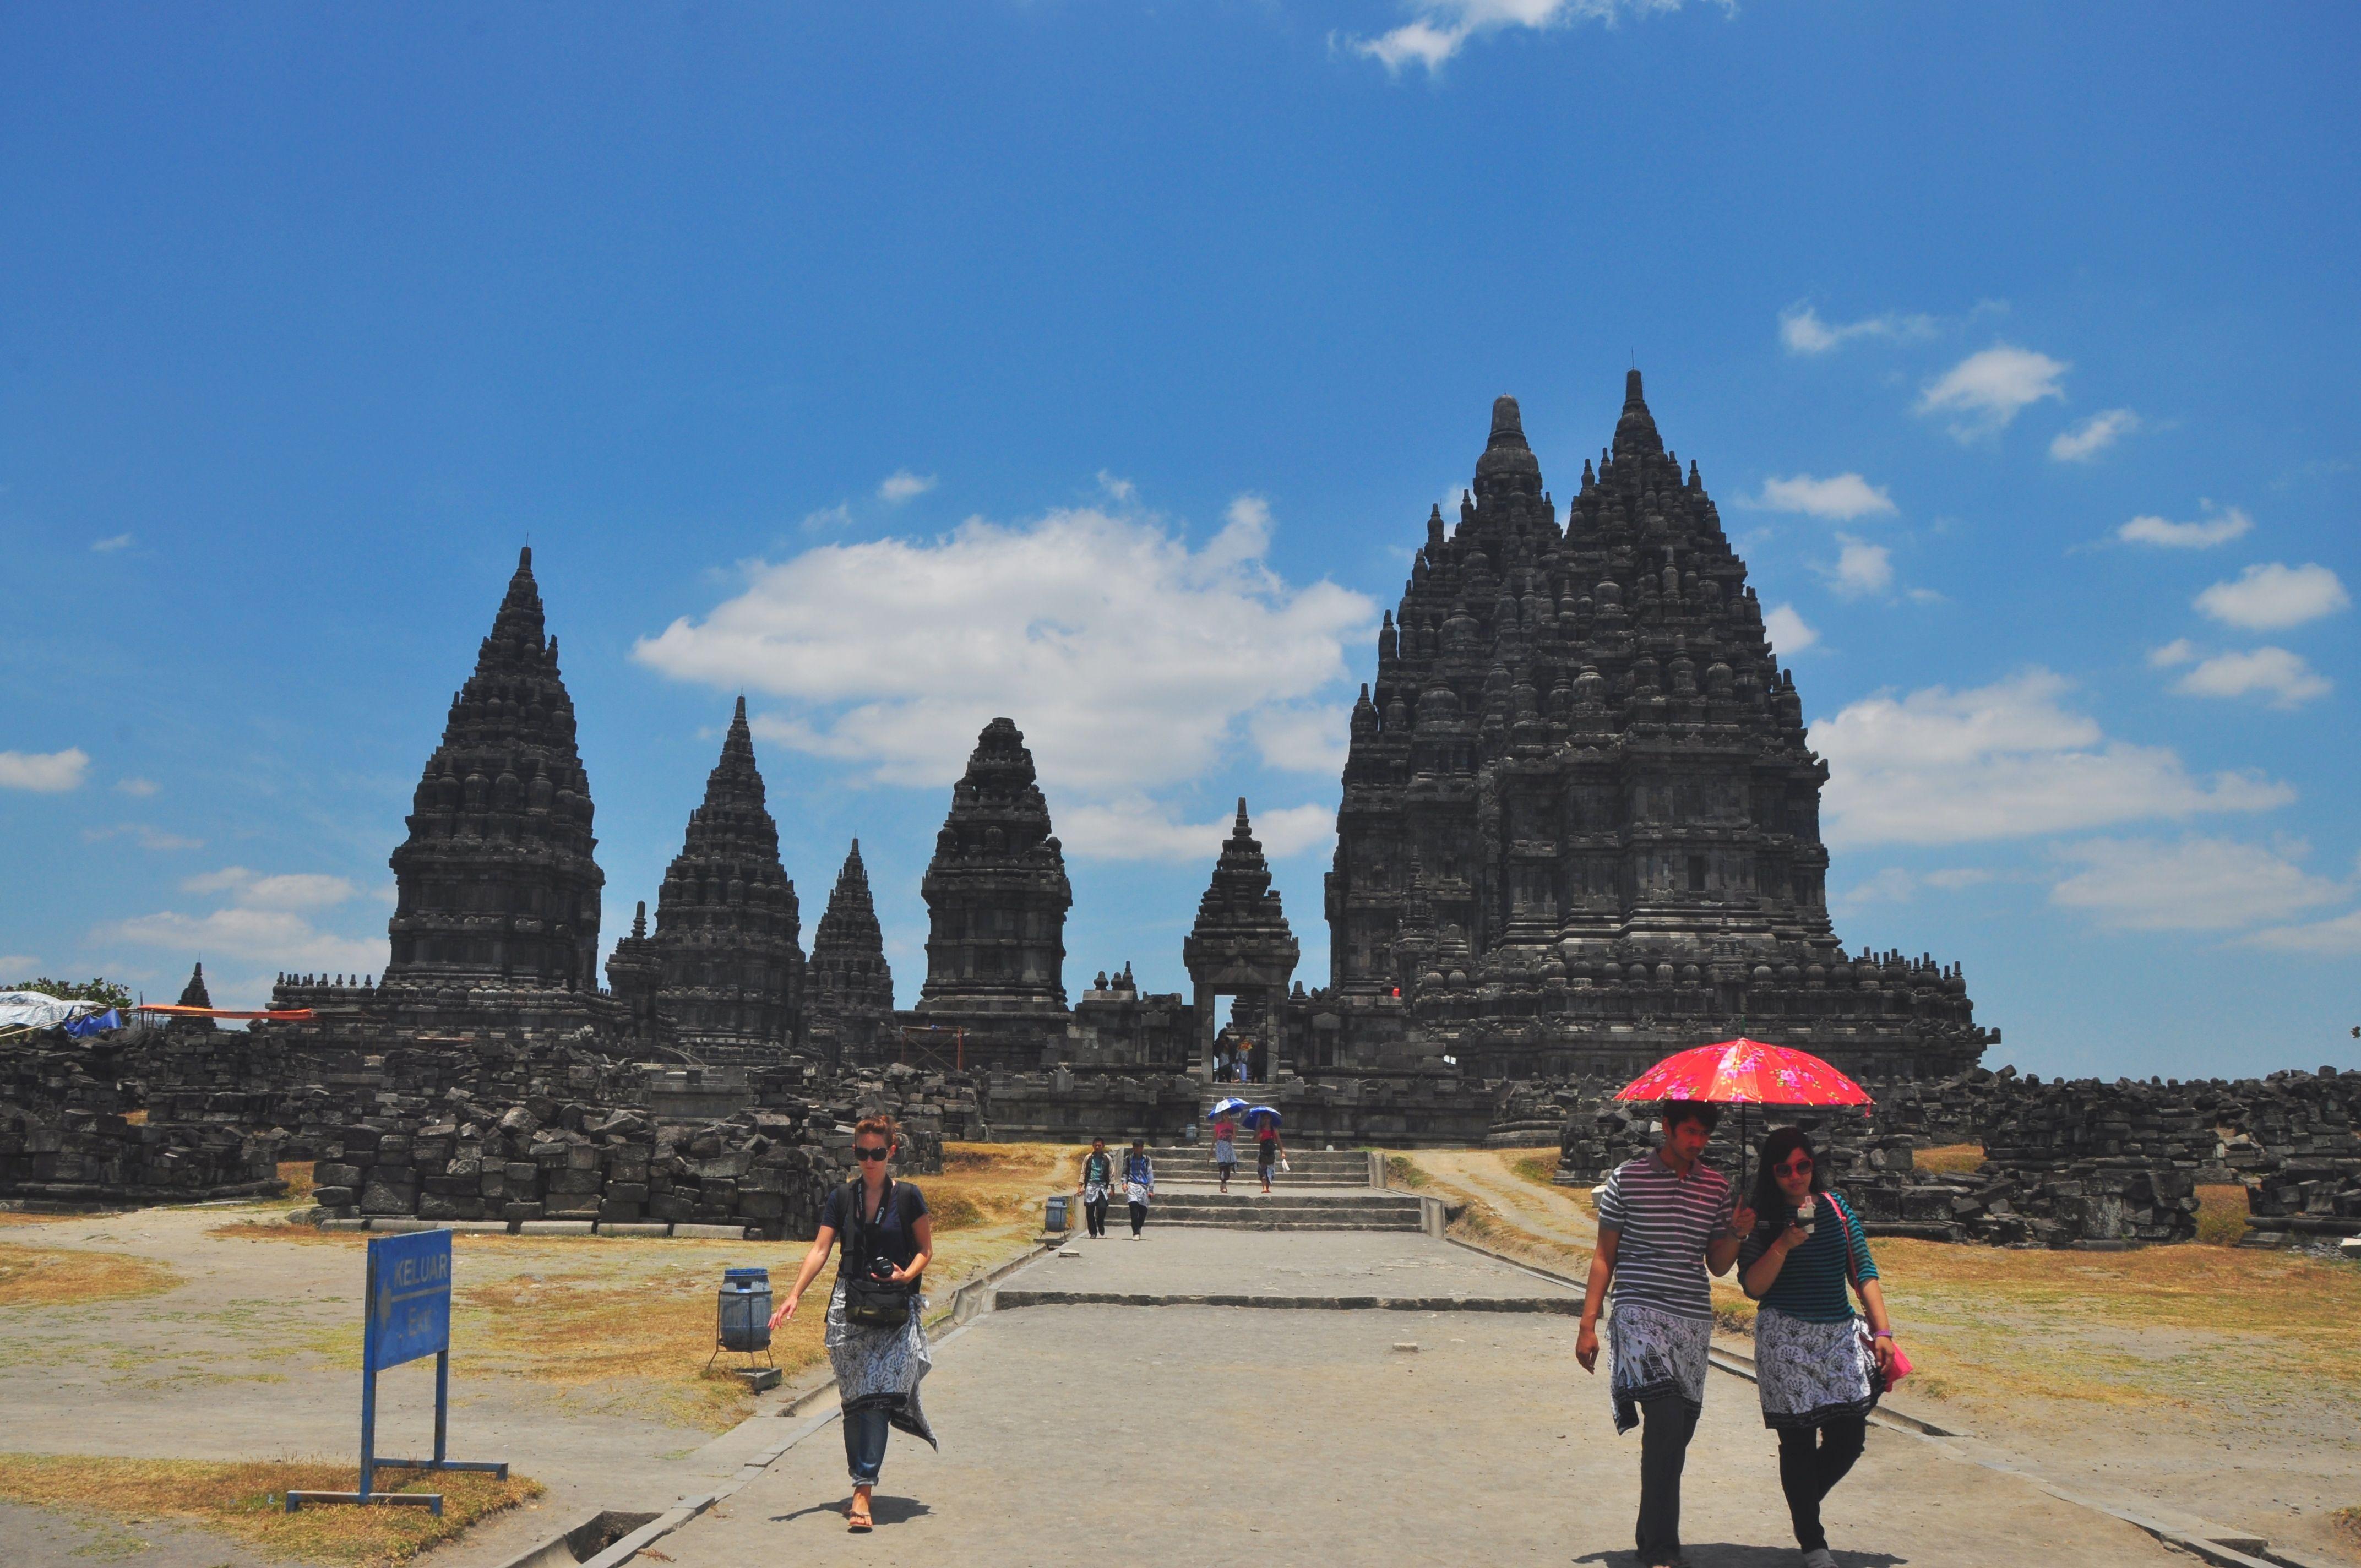 Prambanan, Central Java - copyright architectureofbuddhism.com - read the travel diary at http://architectureofbuddhism.com/books/temples-borobudur-region-travel-diary-day-one/